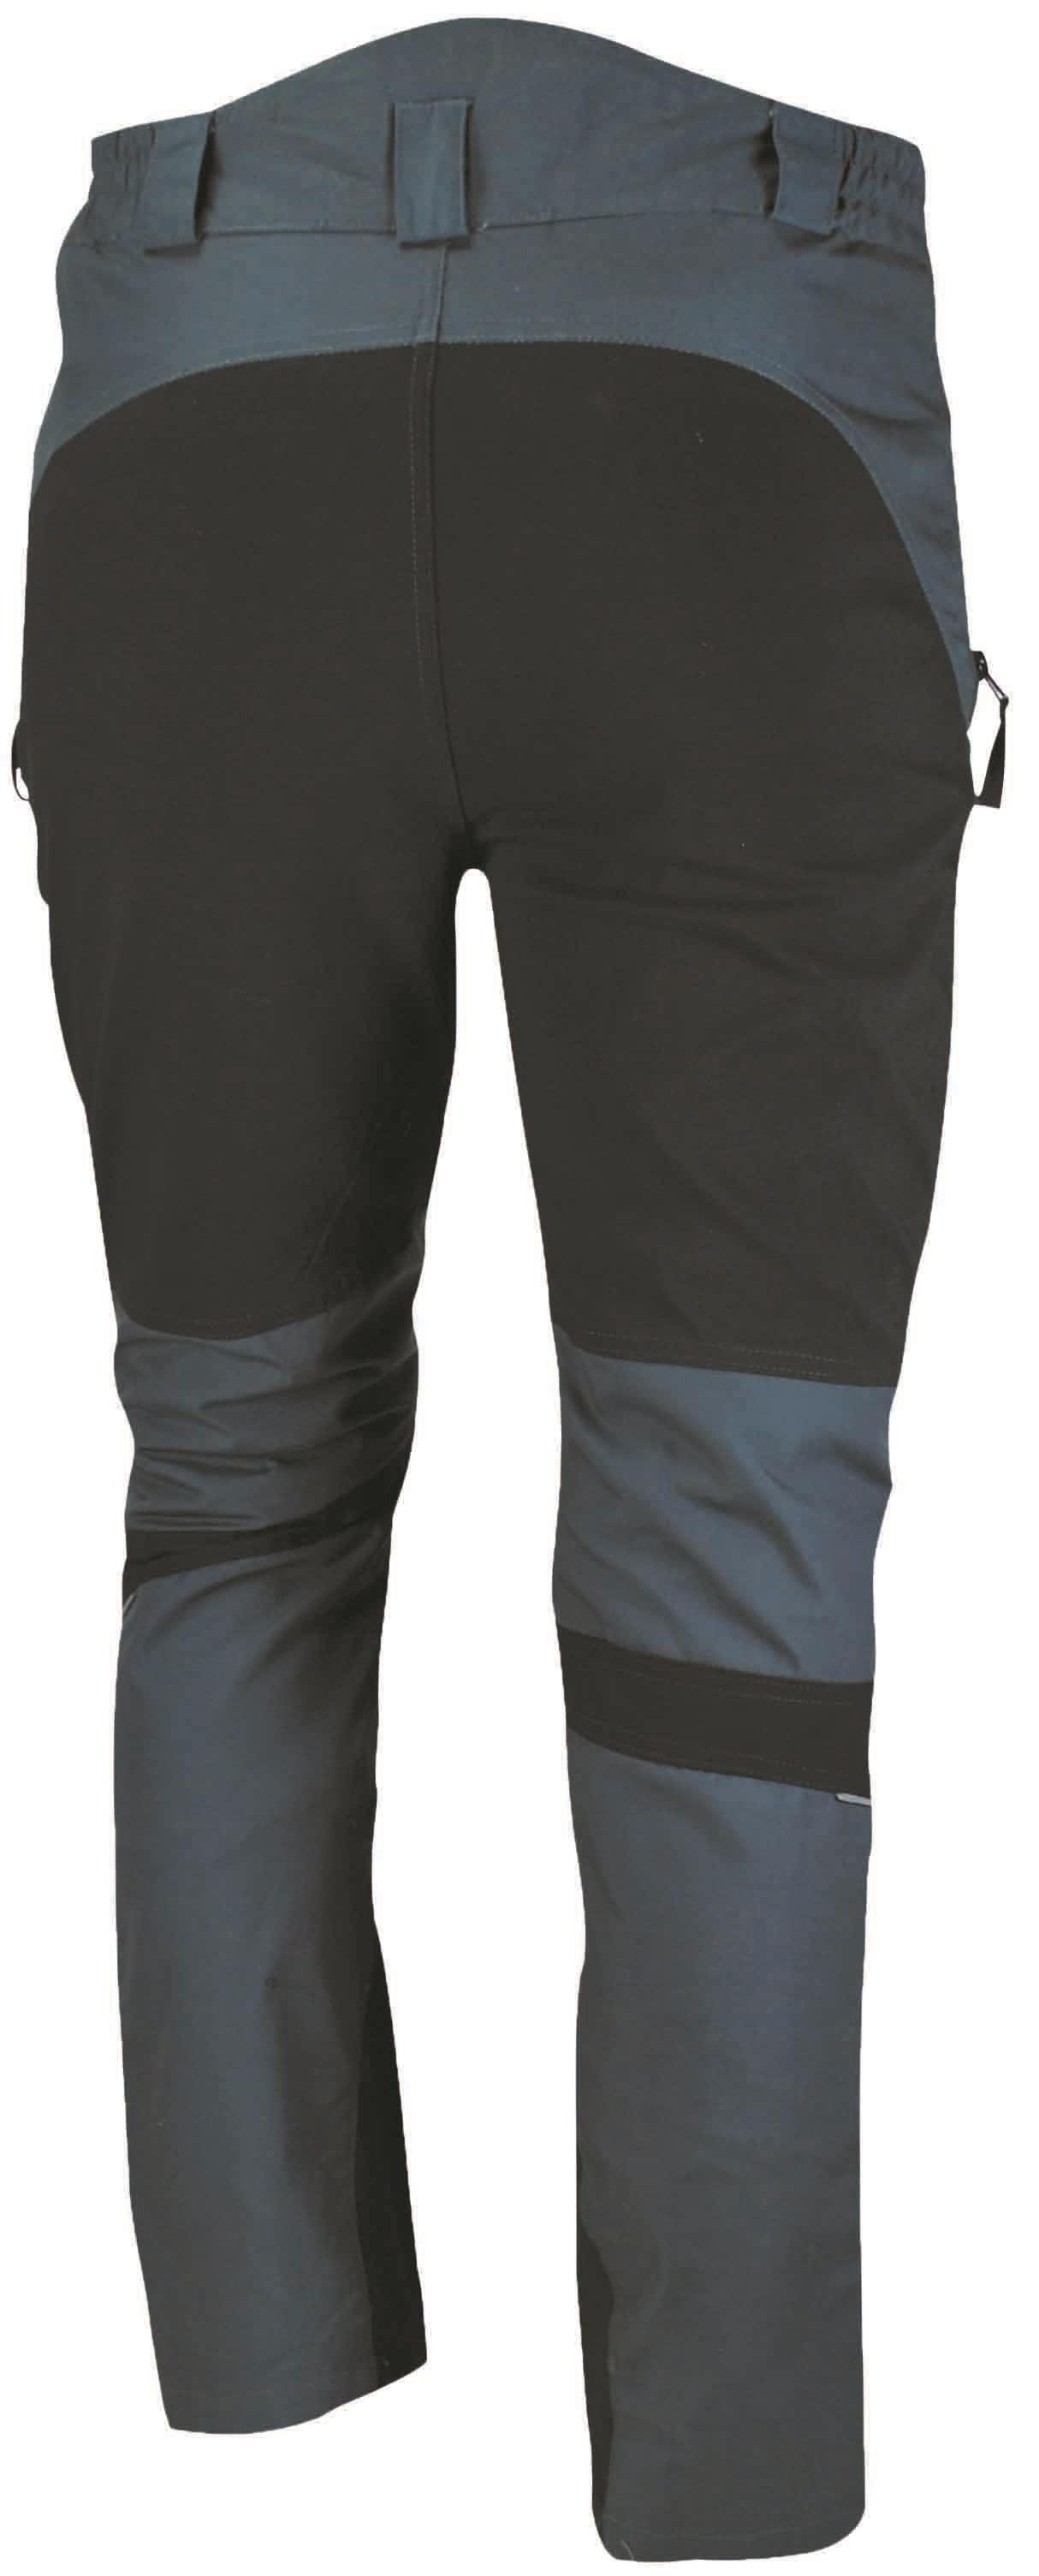 Pantalon multi-activités Workflex Solidur